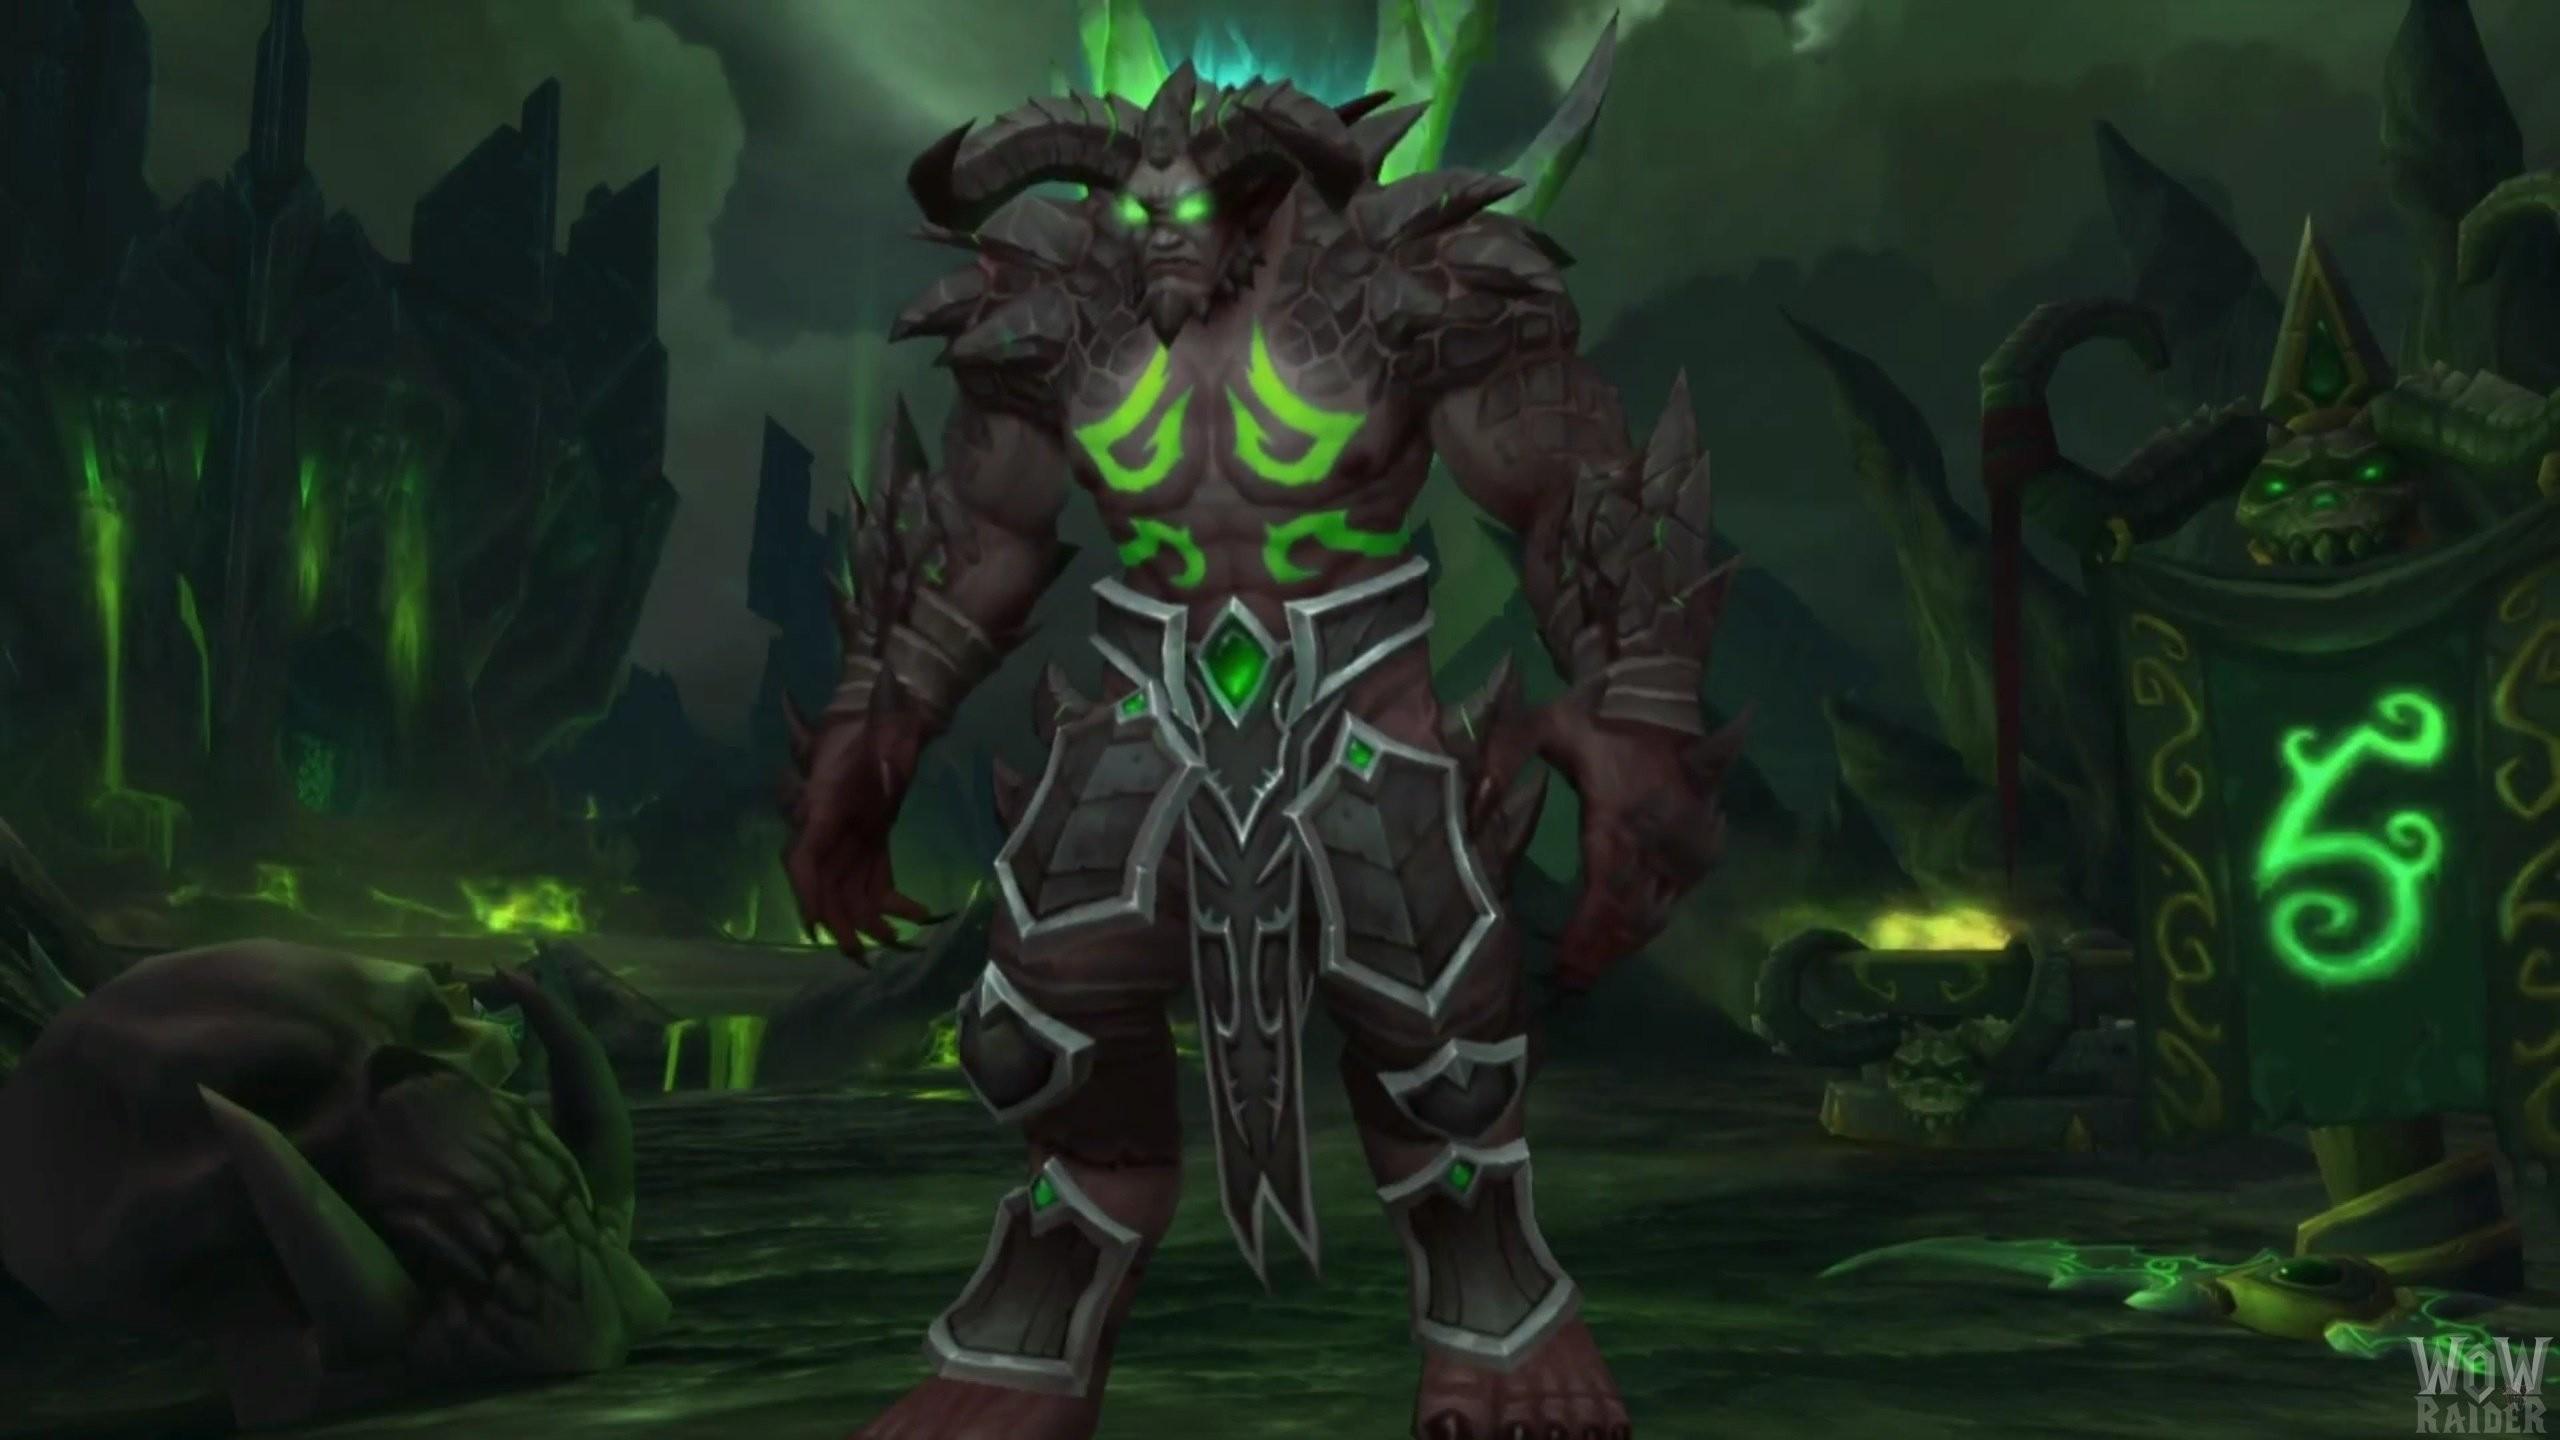 Wallpaper Of World of Warcraft Legion Demon Hunter For Desktop | HD  Wallpapers | Pinterest | Legion demon, Wallpaper and Warcraft legion